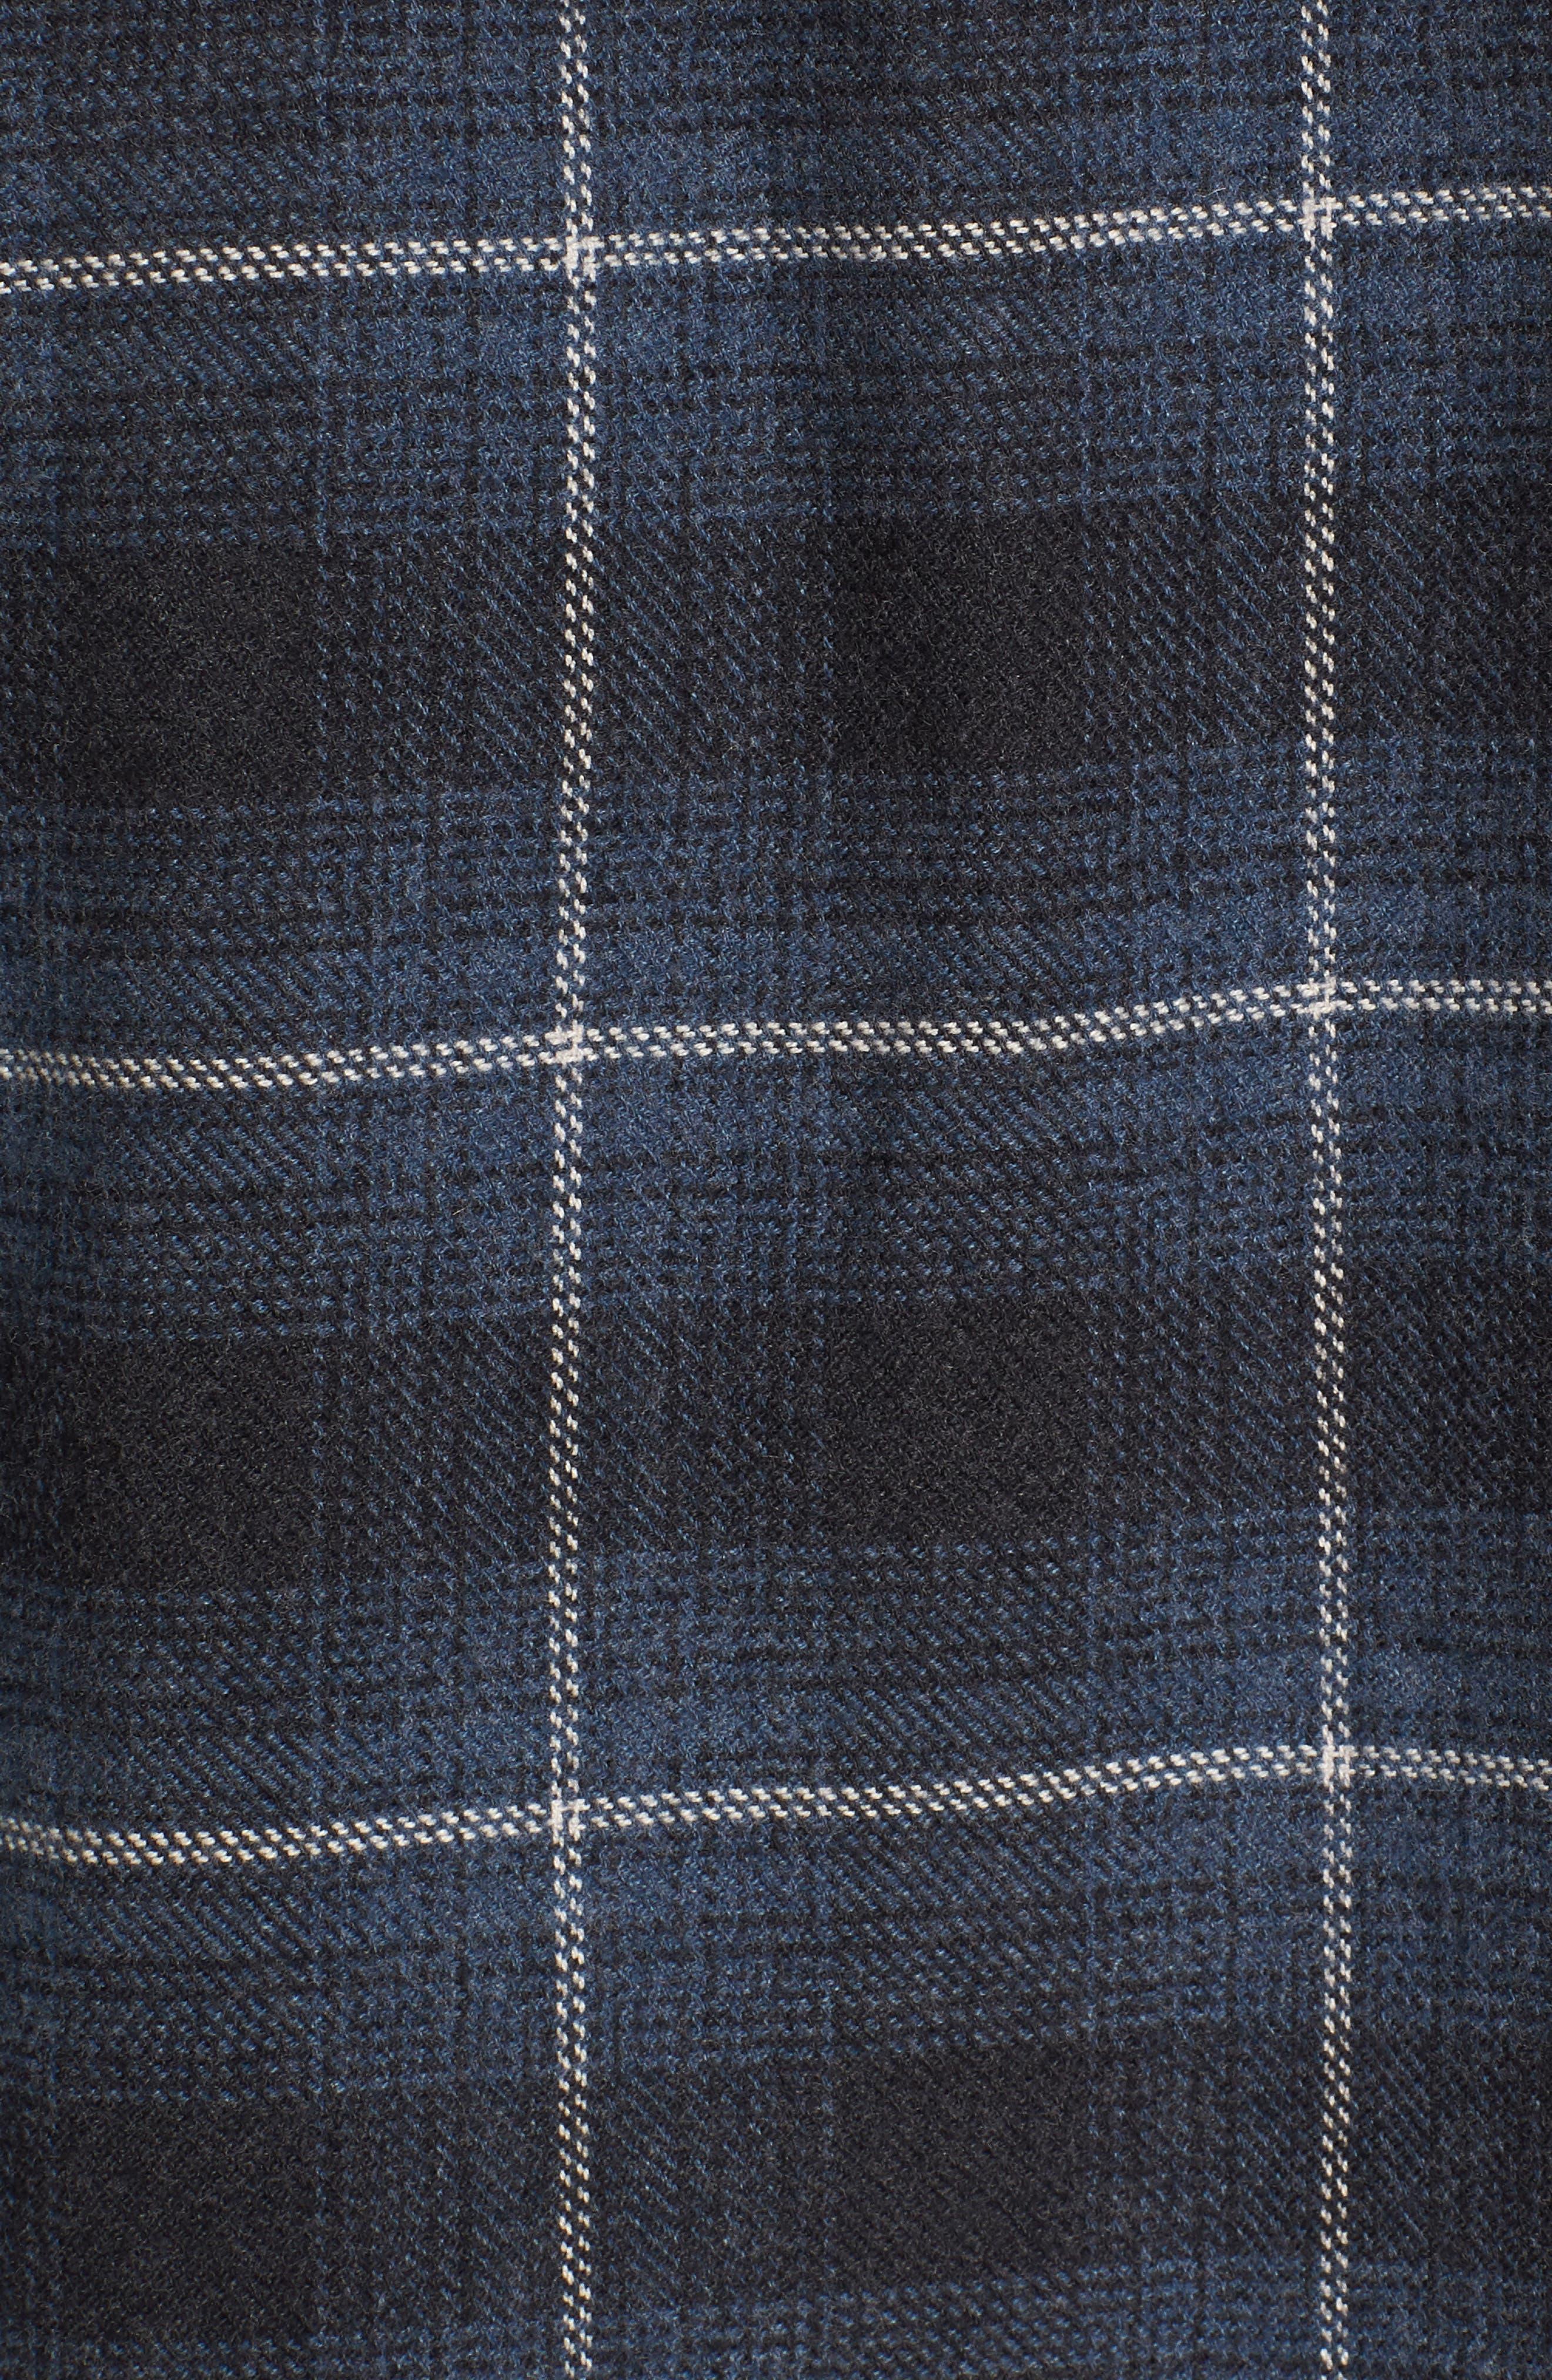 Clarke Heritage Flannel Shirt,                             Alternate thumbnail 5, color,                             Blue Charcoal